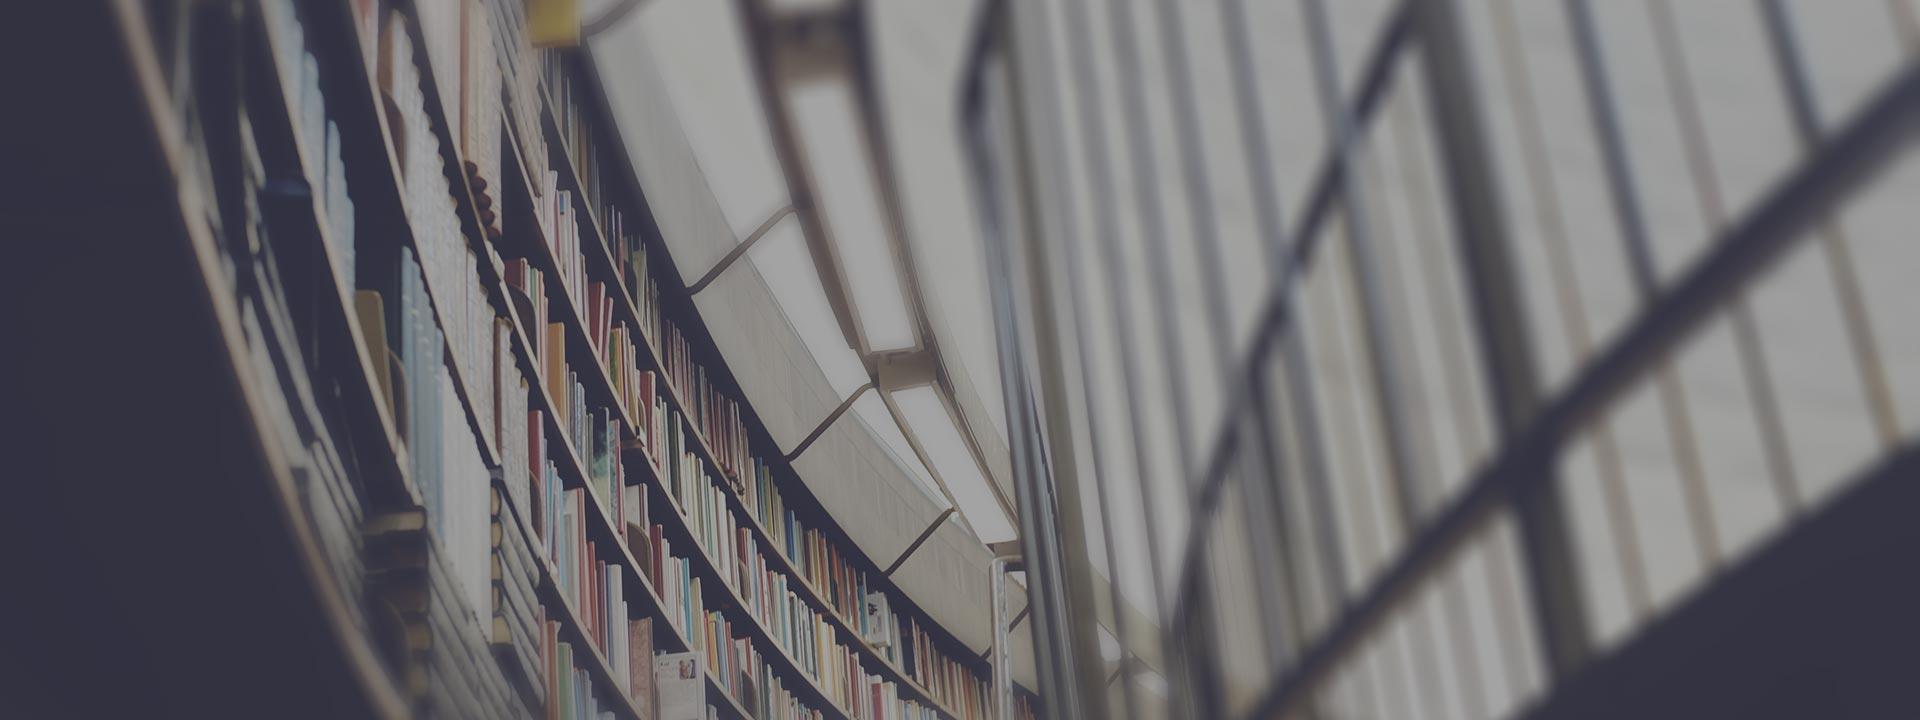 book-cover-7-habits-summary-desktop-dark-less-blurry.jpg